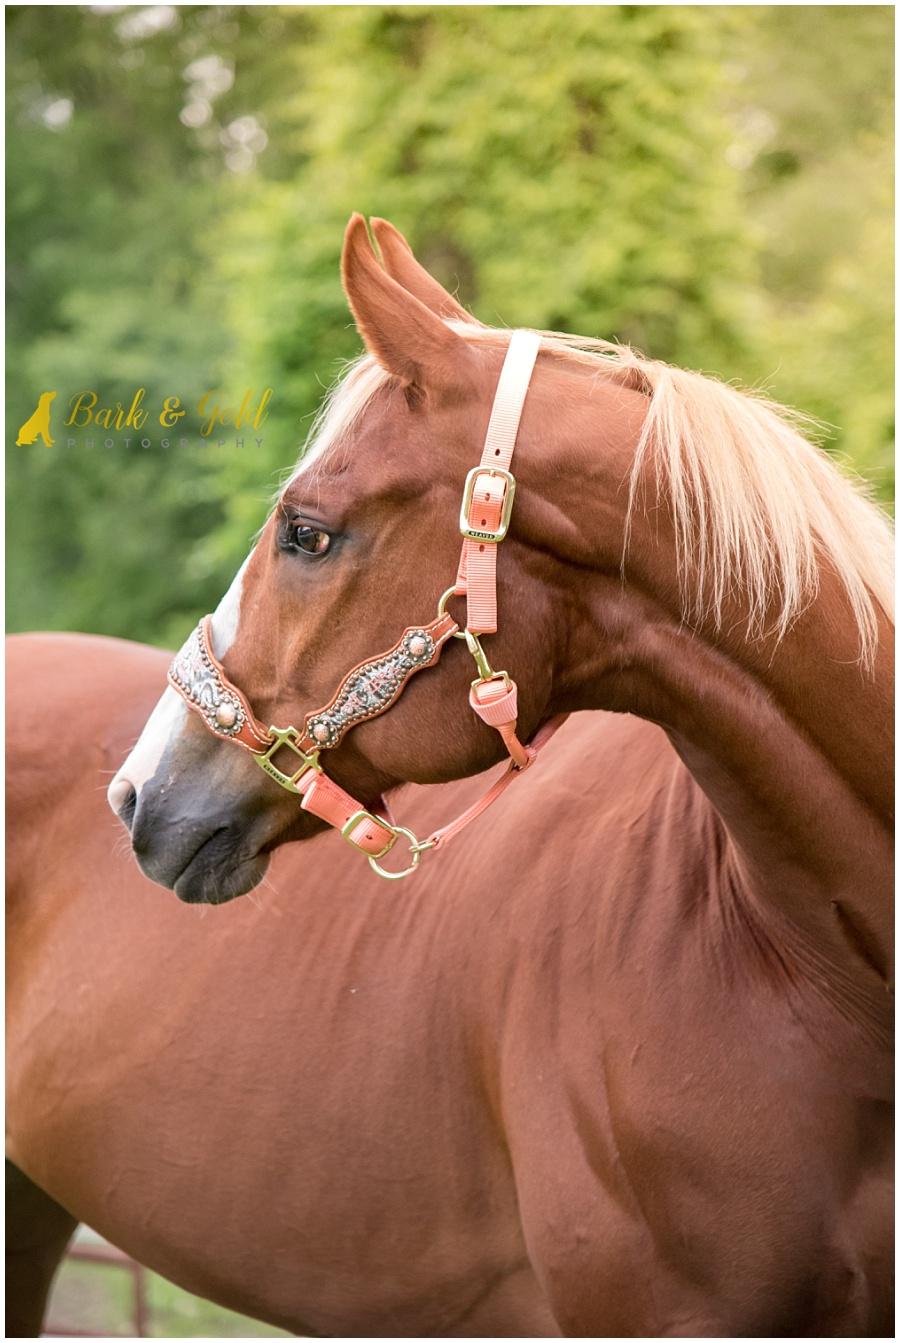 American Quarter Horse looking left